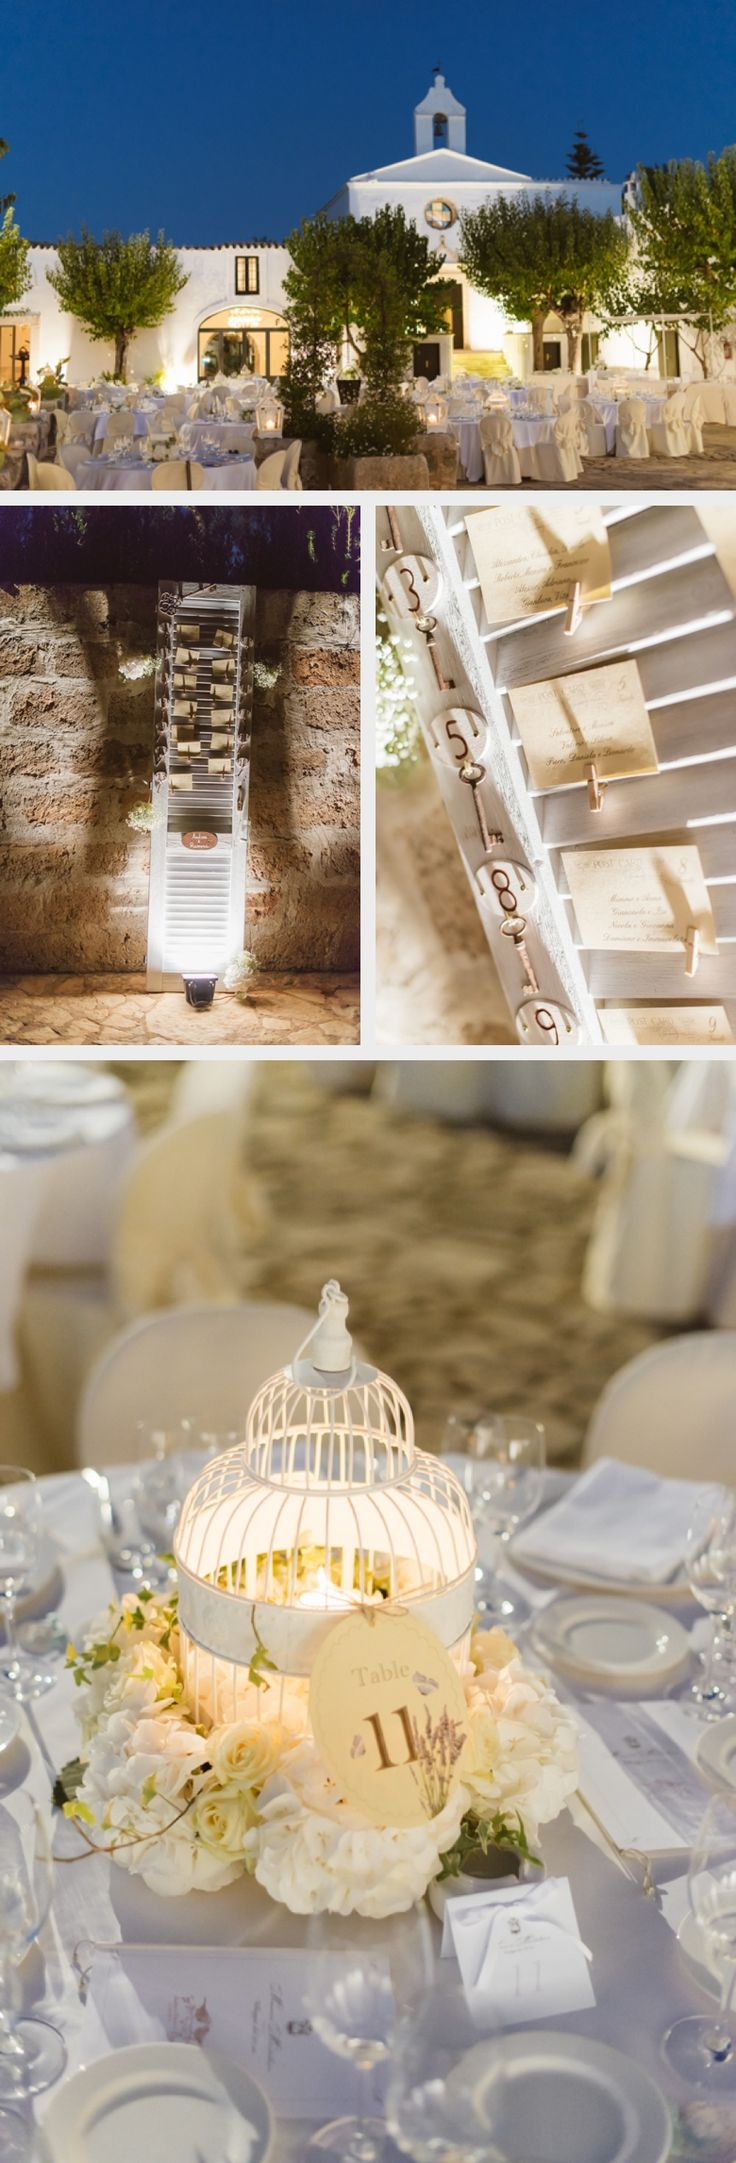 Wedding reception | Masseria Montalbano - Ostuni - Puglia #wedding #masseria  Photographer: Aberrazioni Cromatiche studio